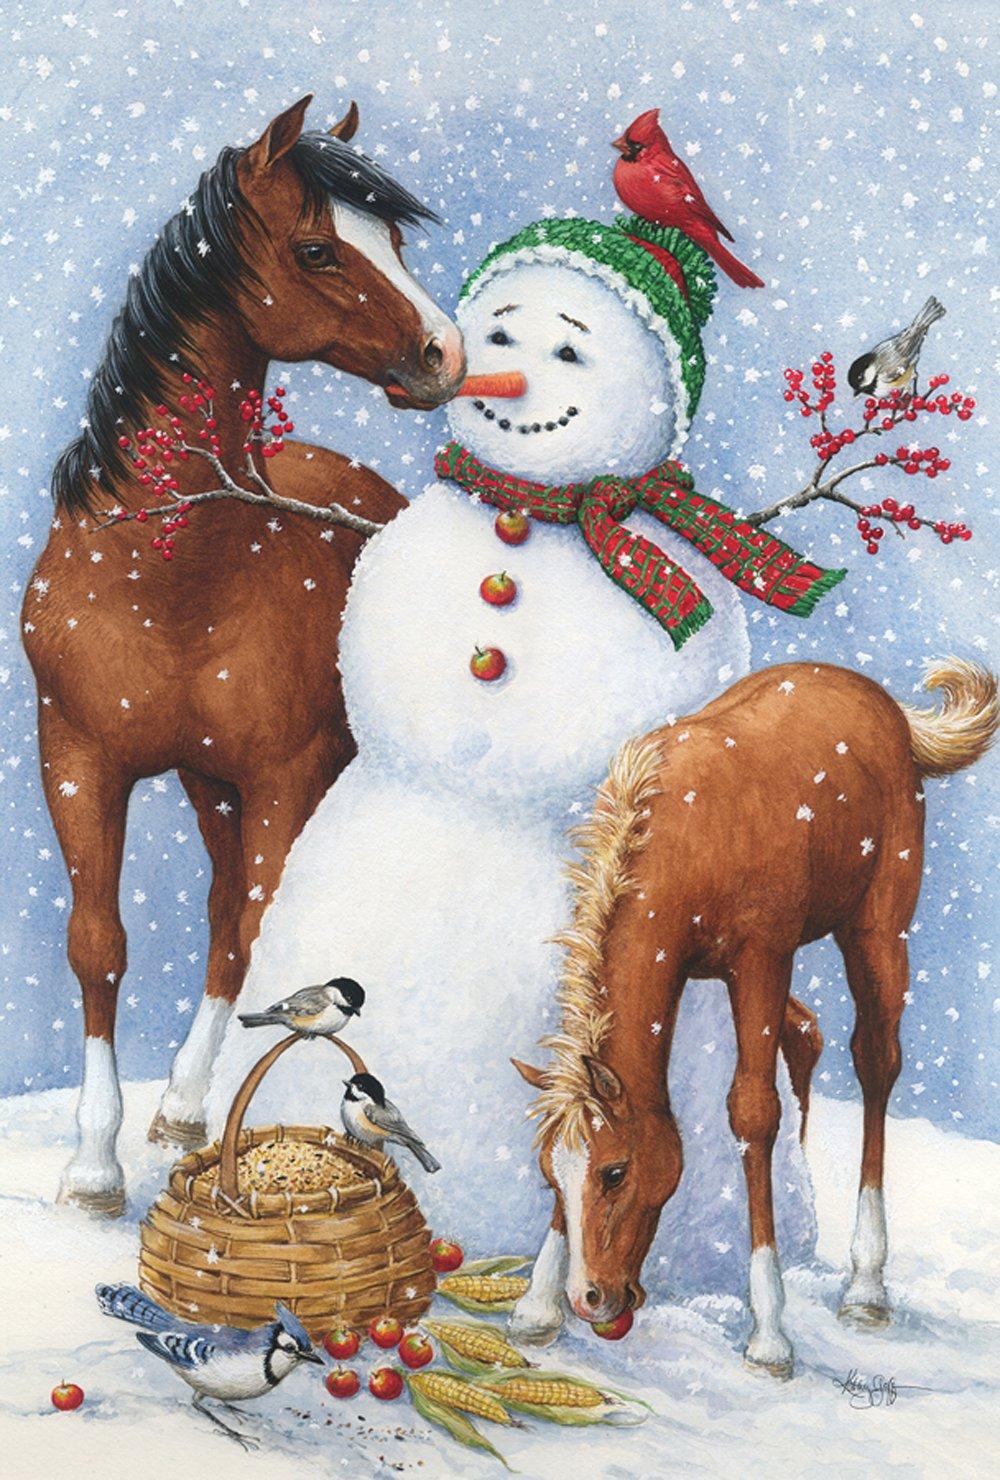 Toland Home Garden Snowman Pasture 28 x 40 Inch Decorative Winter Horse Farm House Flag - 1010475